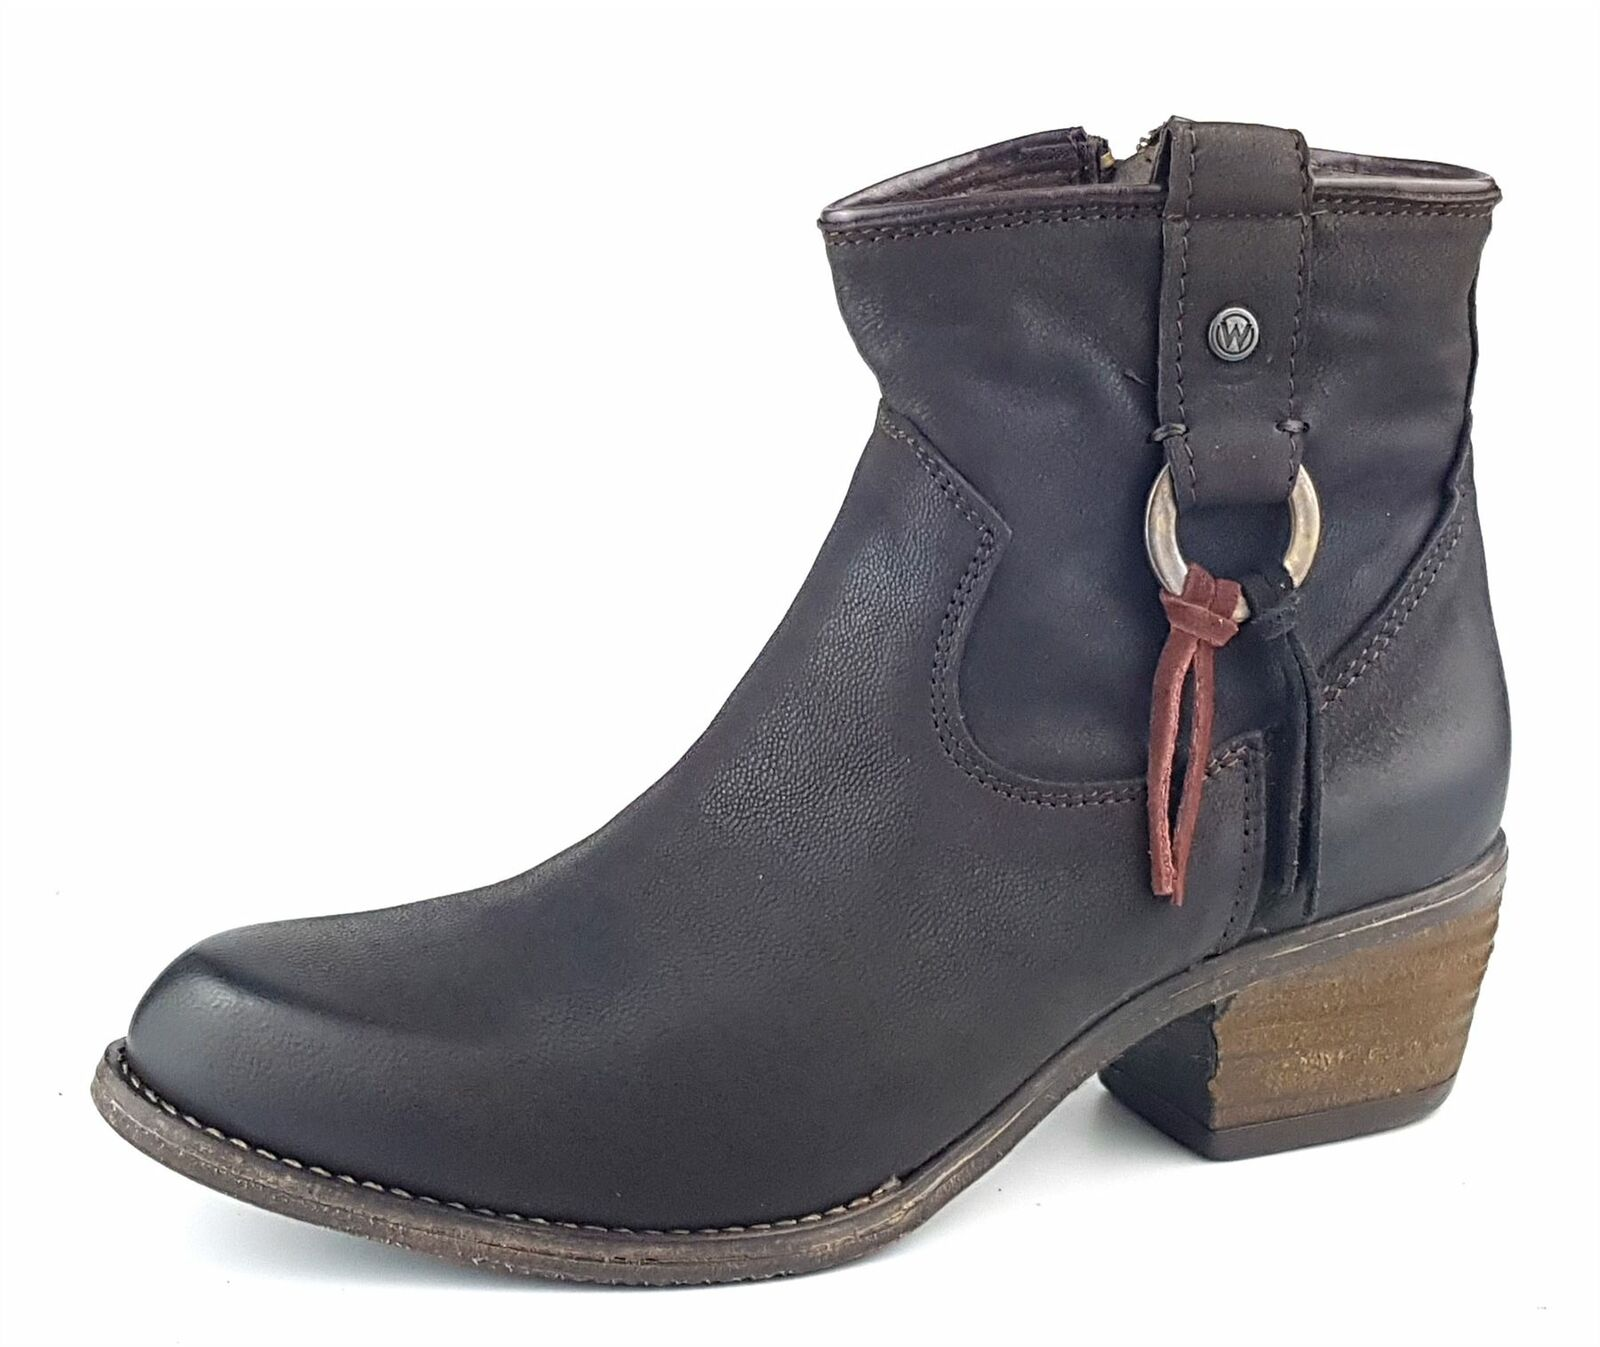 Wrangler Carson Ring Ankle Leather Chelsea Heel Stiefel Dark braun